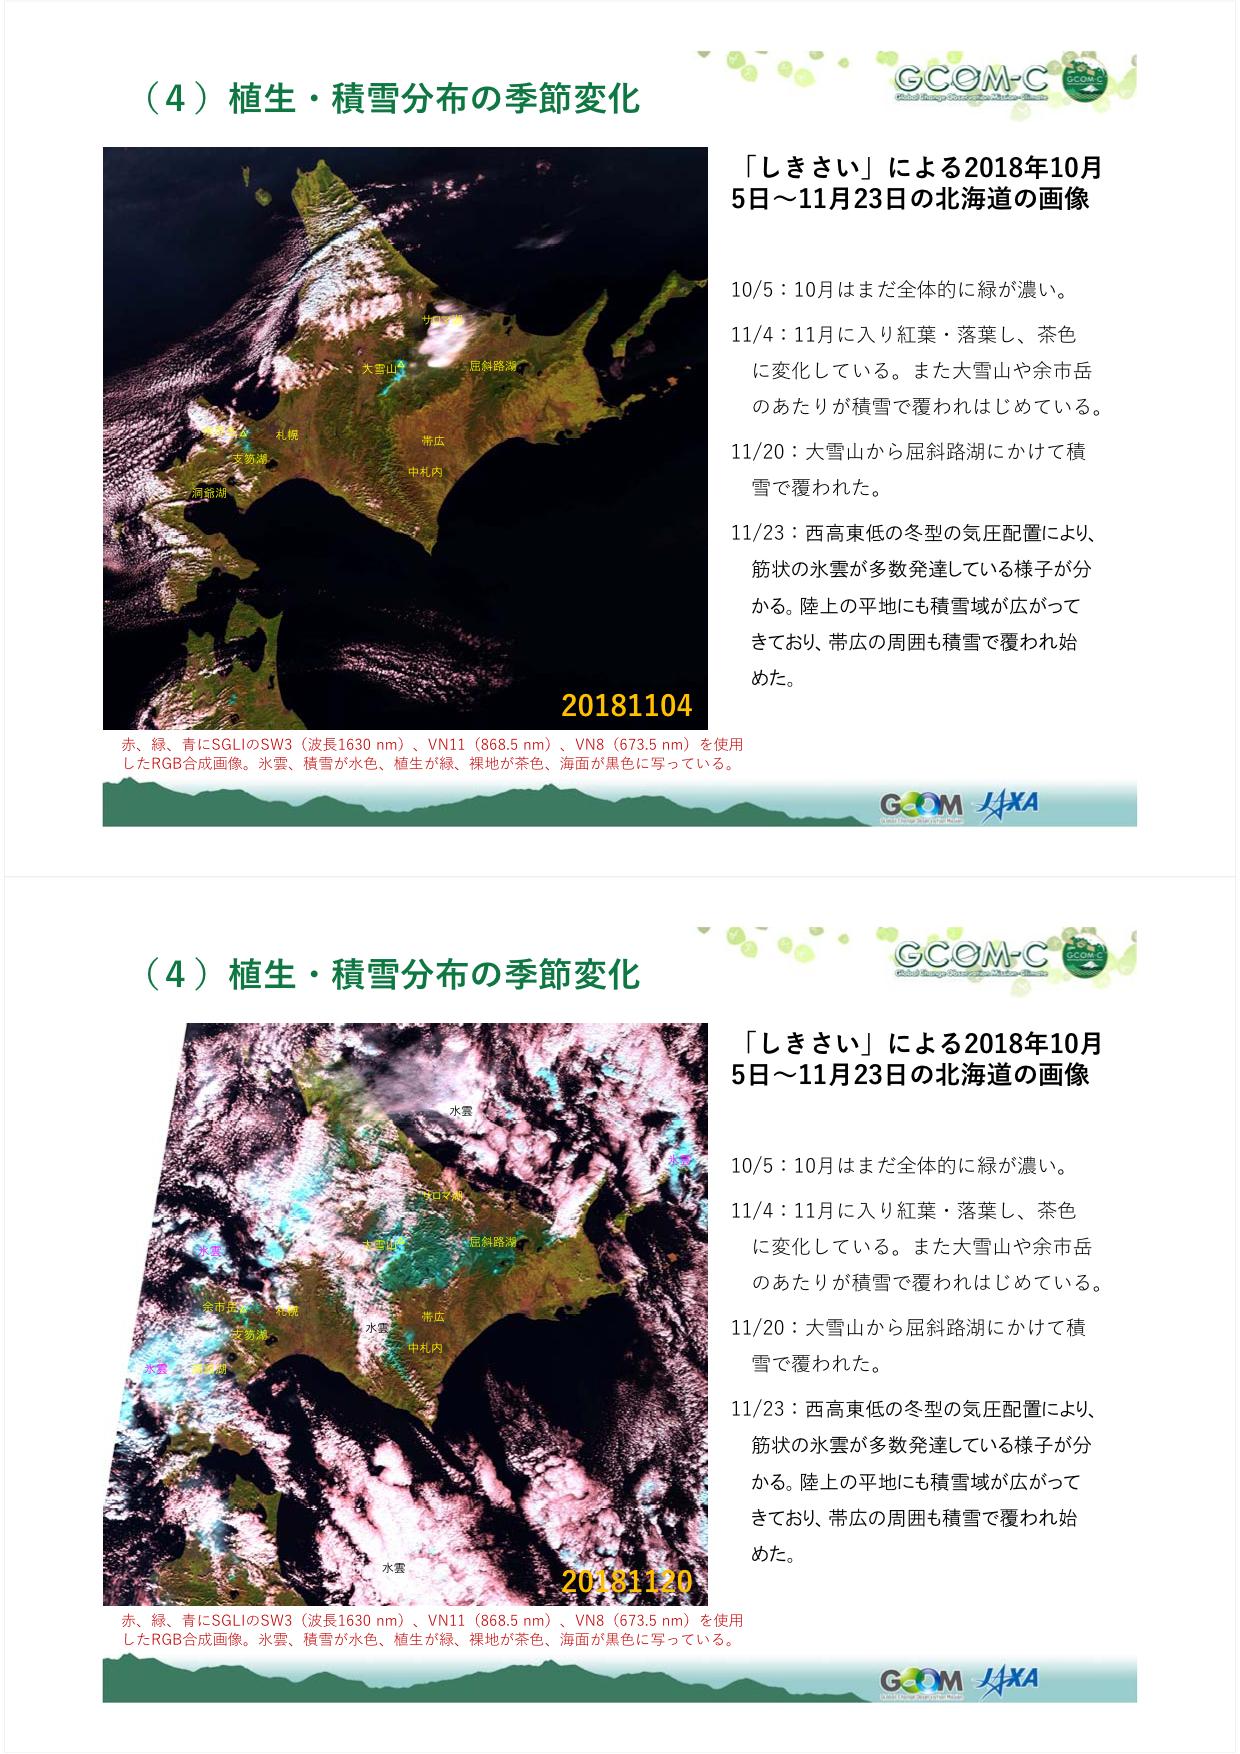 f:id:Imamura:20181220152516p:plain